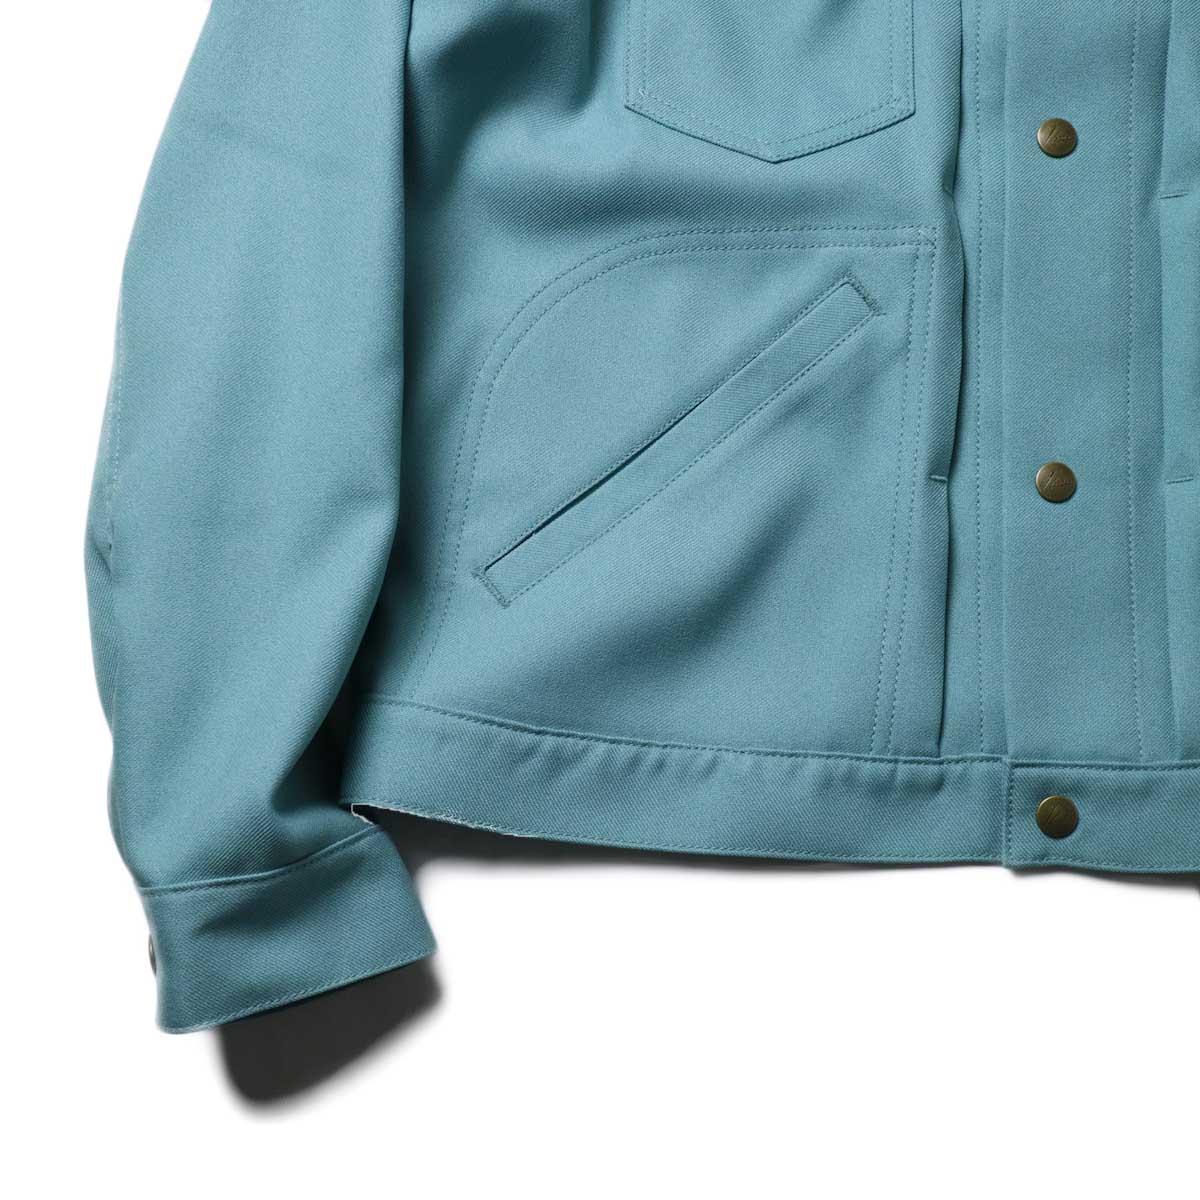 Needles / Penny Jean Jacket -Poly Twill (Sax)袖、裾